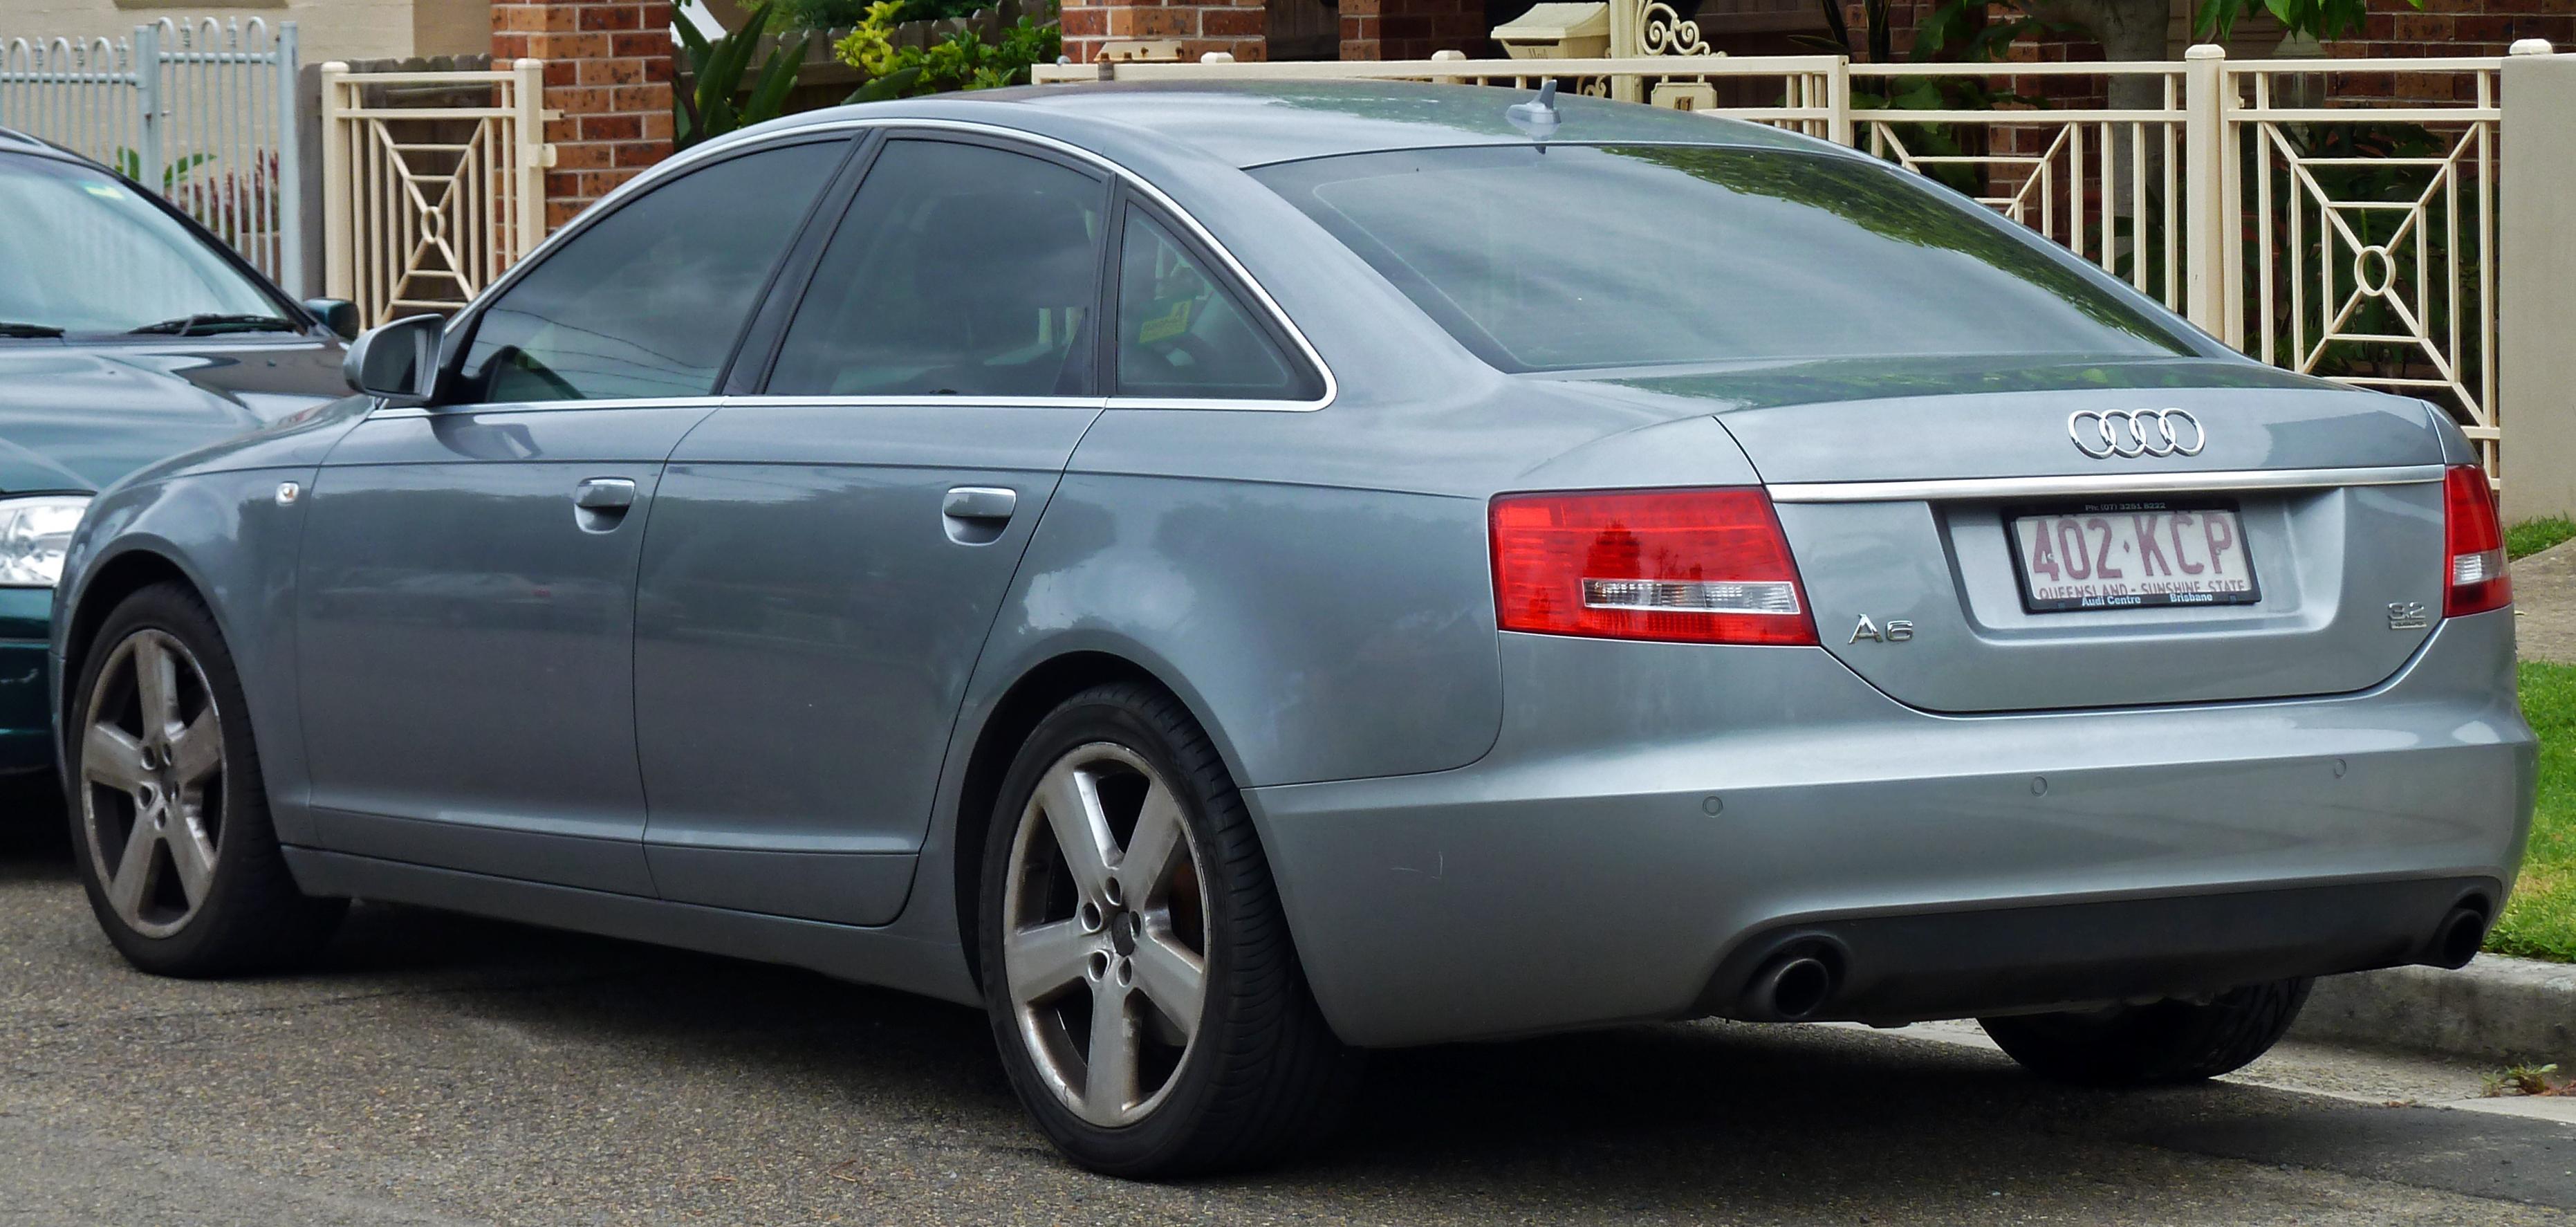 2004 Audi A6 Image 13